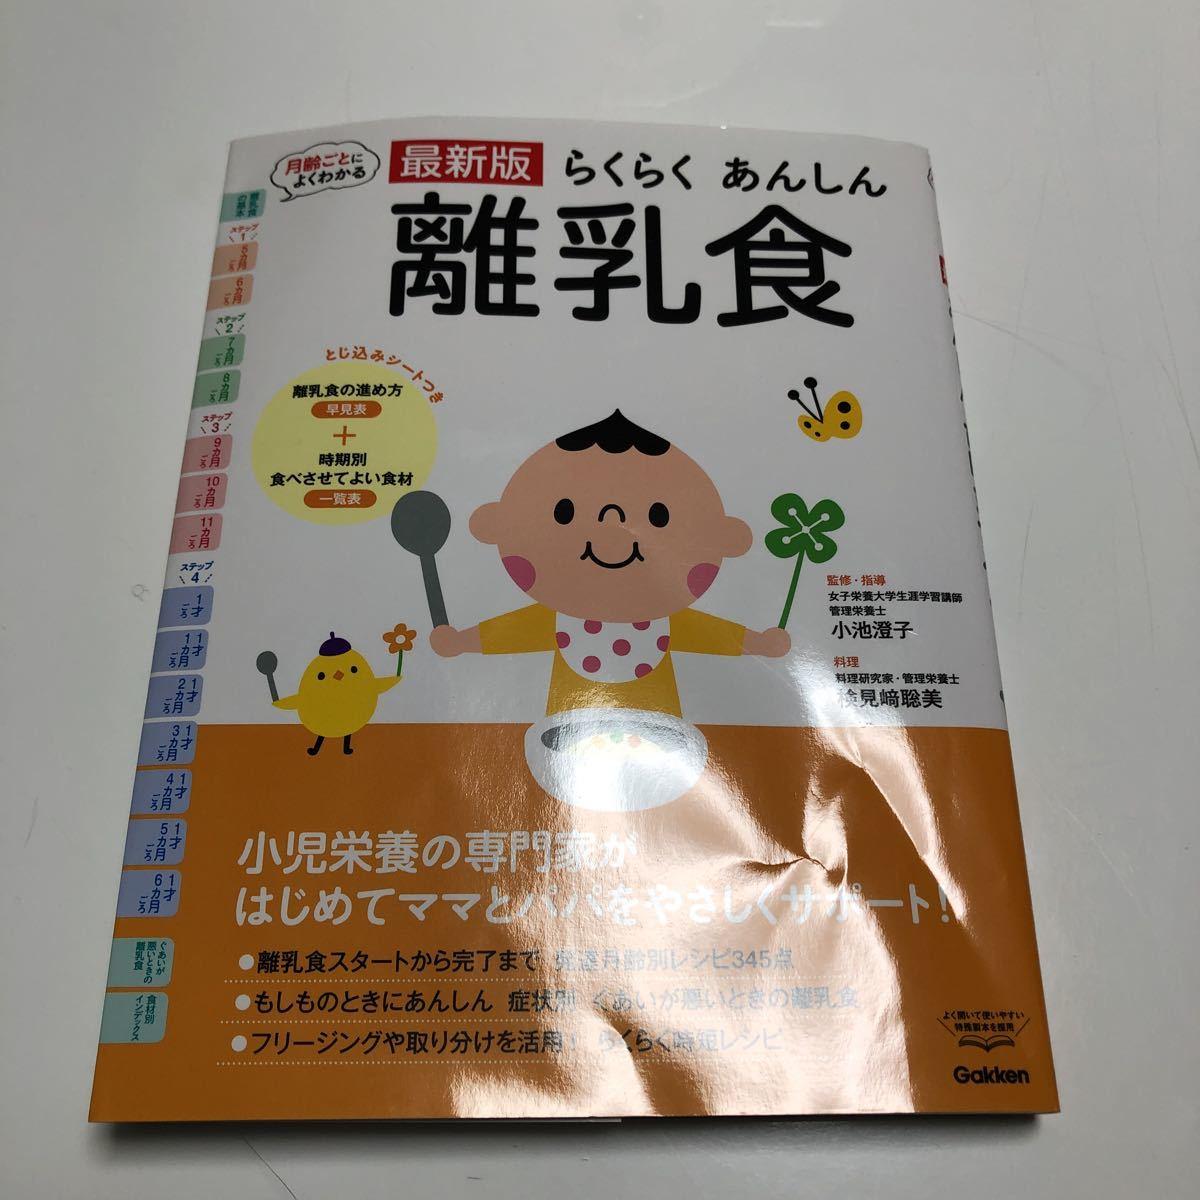 Gakken 学研 最新版 らくらく あんしん 離乳食 本